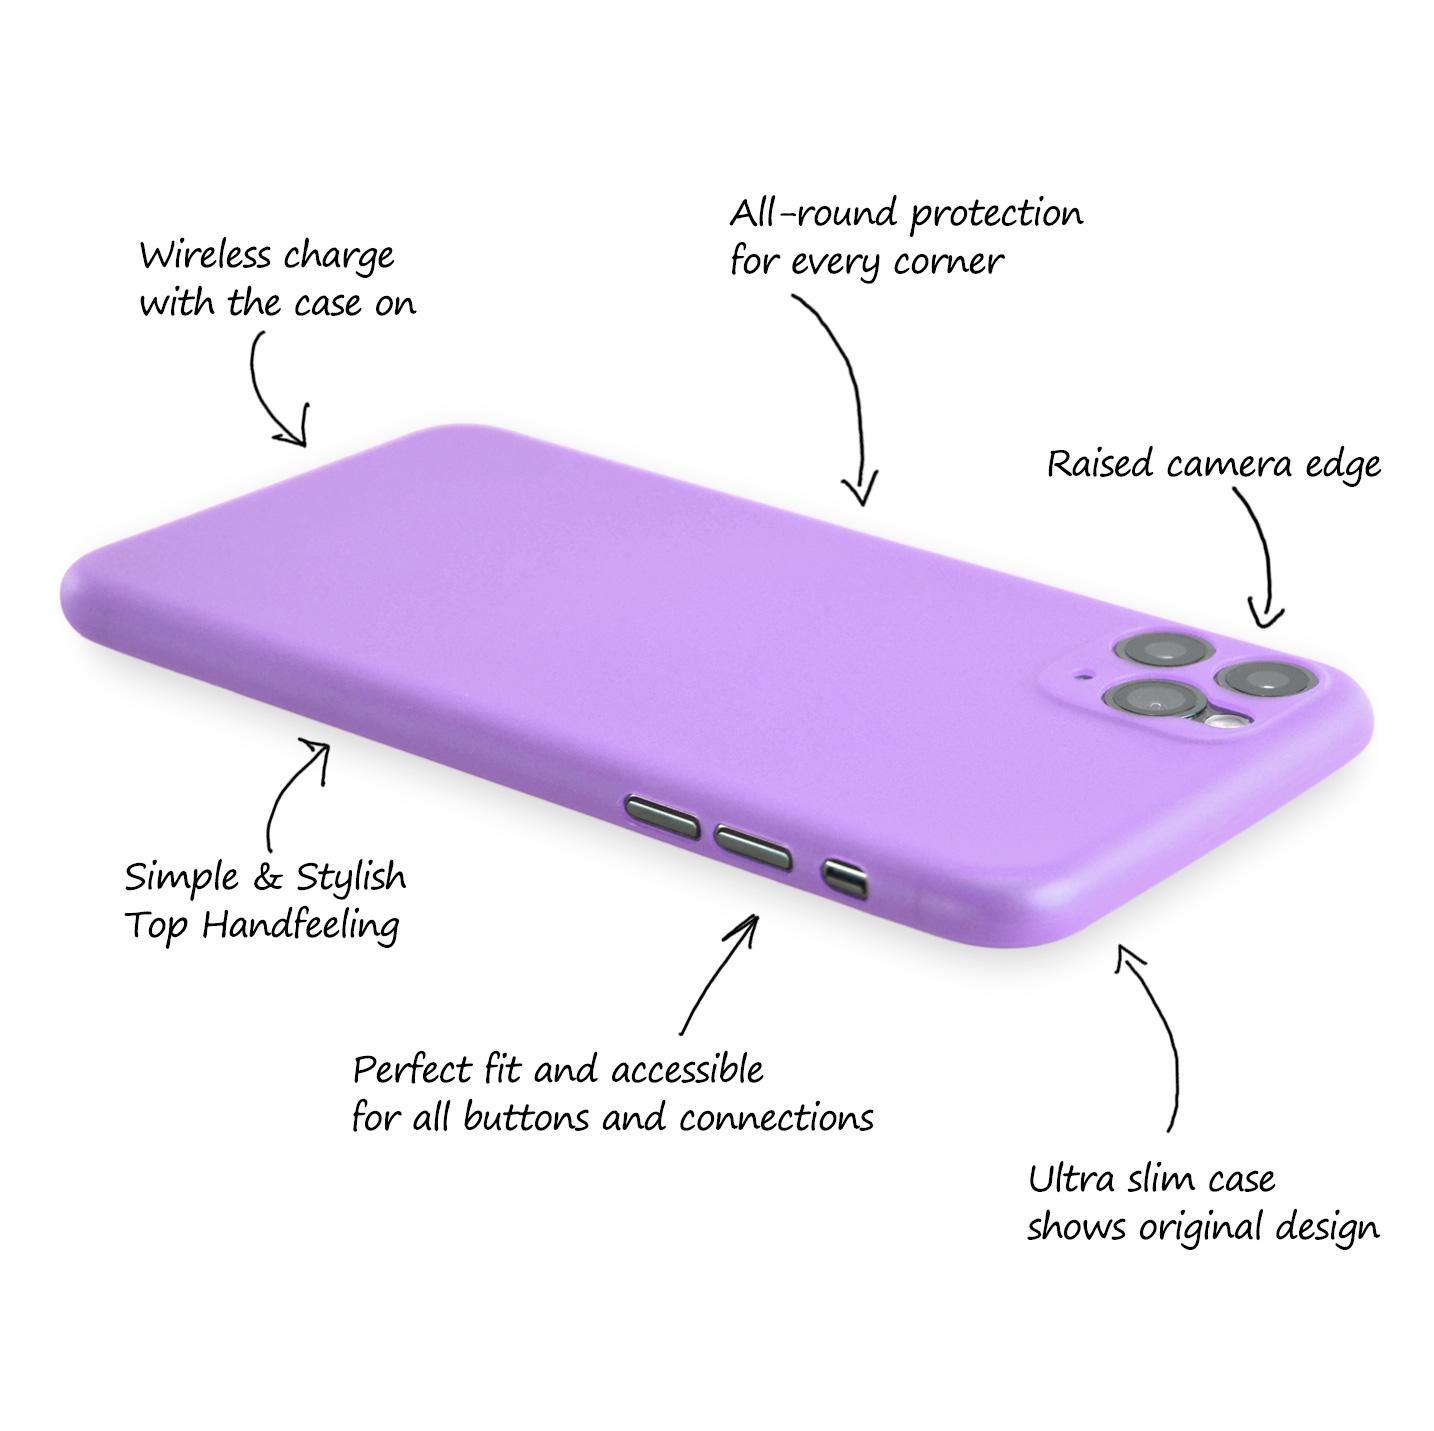 Ultra-Slim-Case-iPhone-11-Pro-5-8-034-Matt-Clear-Schutz-Huelle-Skin-Cover-Etui-Folie Indexbild 22